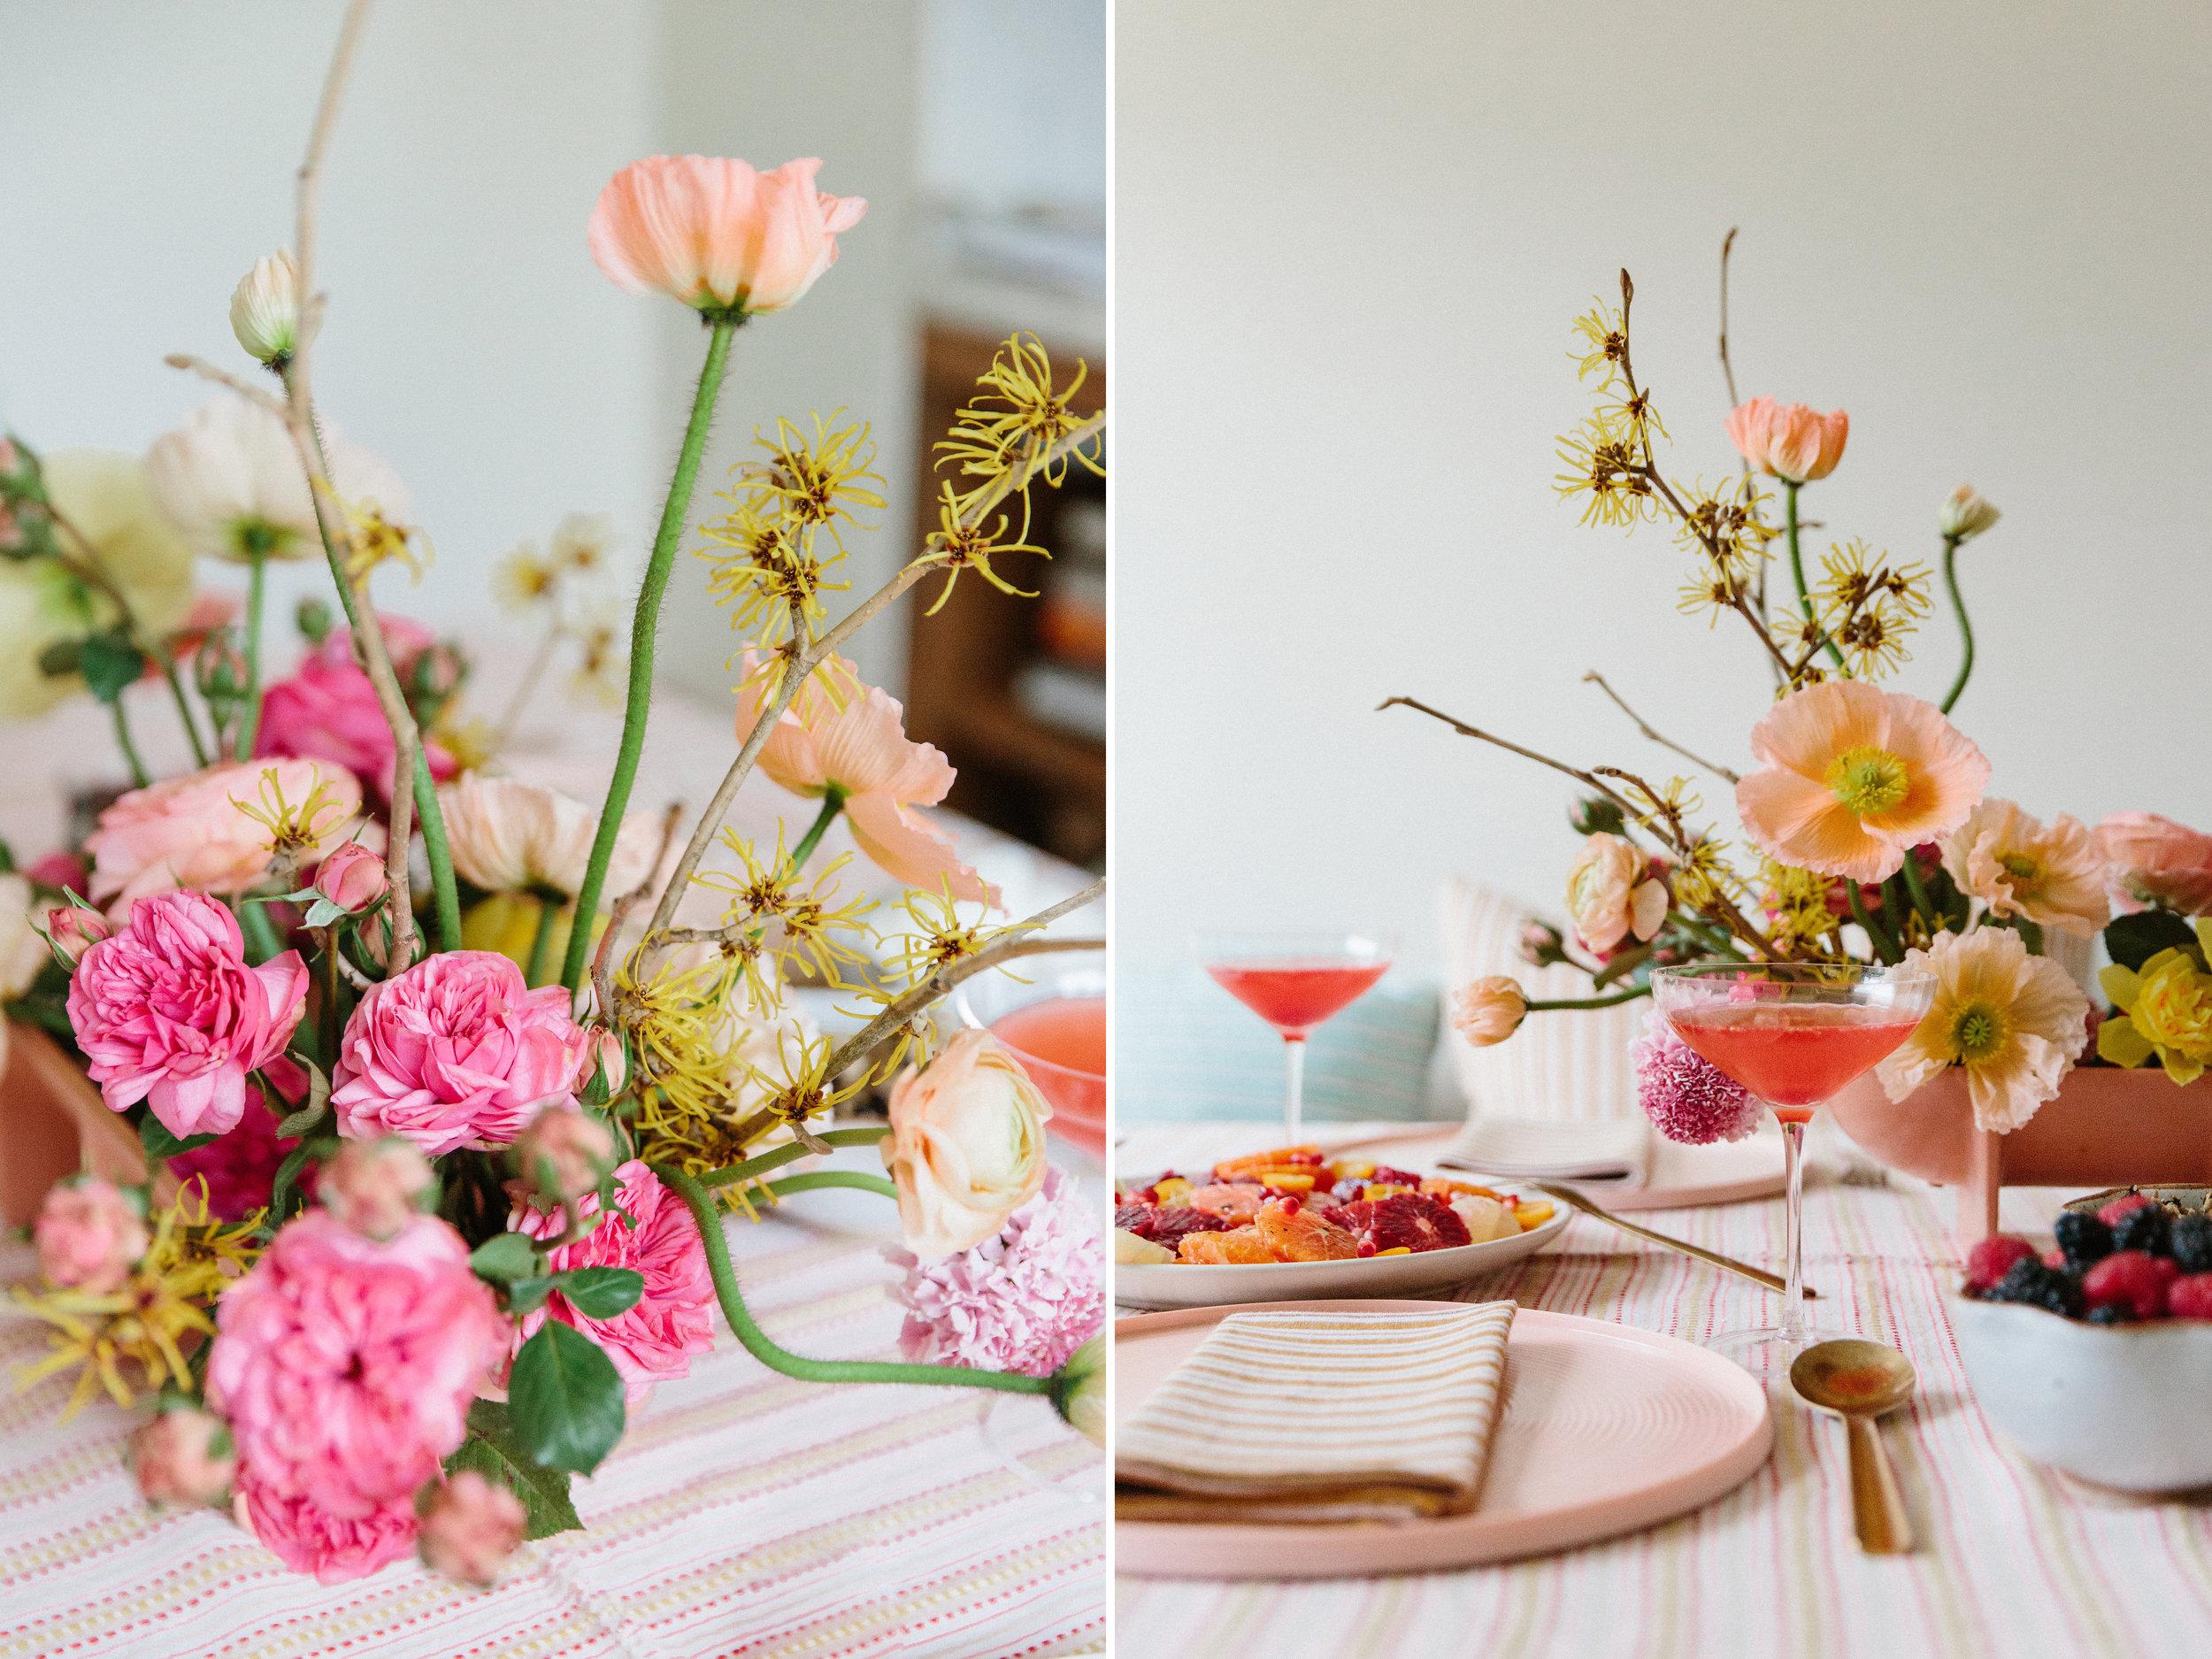 glitter-guide-editorial_heather-taylor_valentines-day-brunch-event-photography_nicki-sebastian_6.jpg